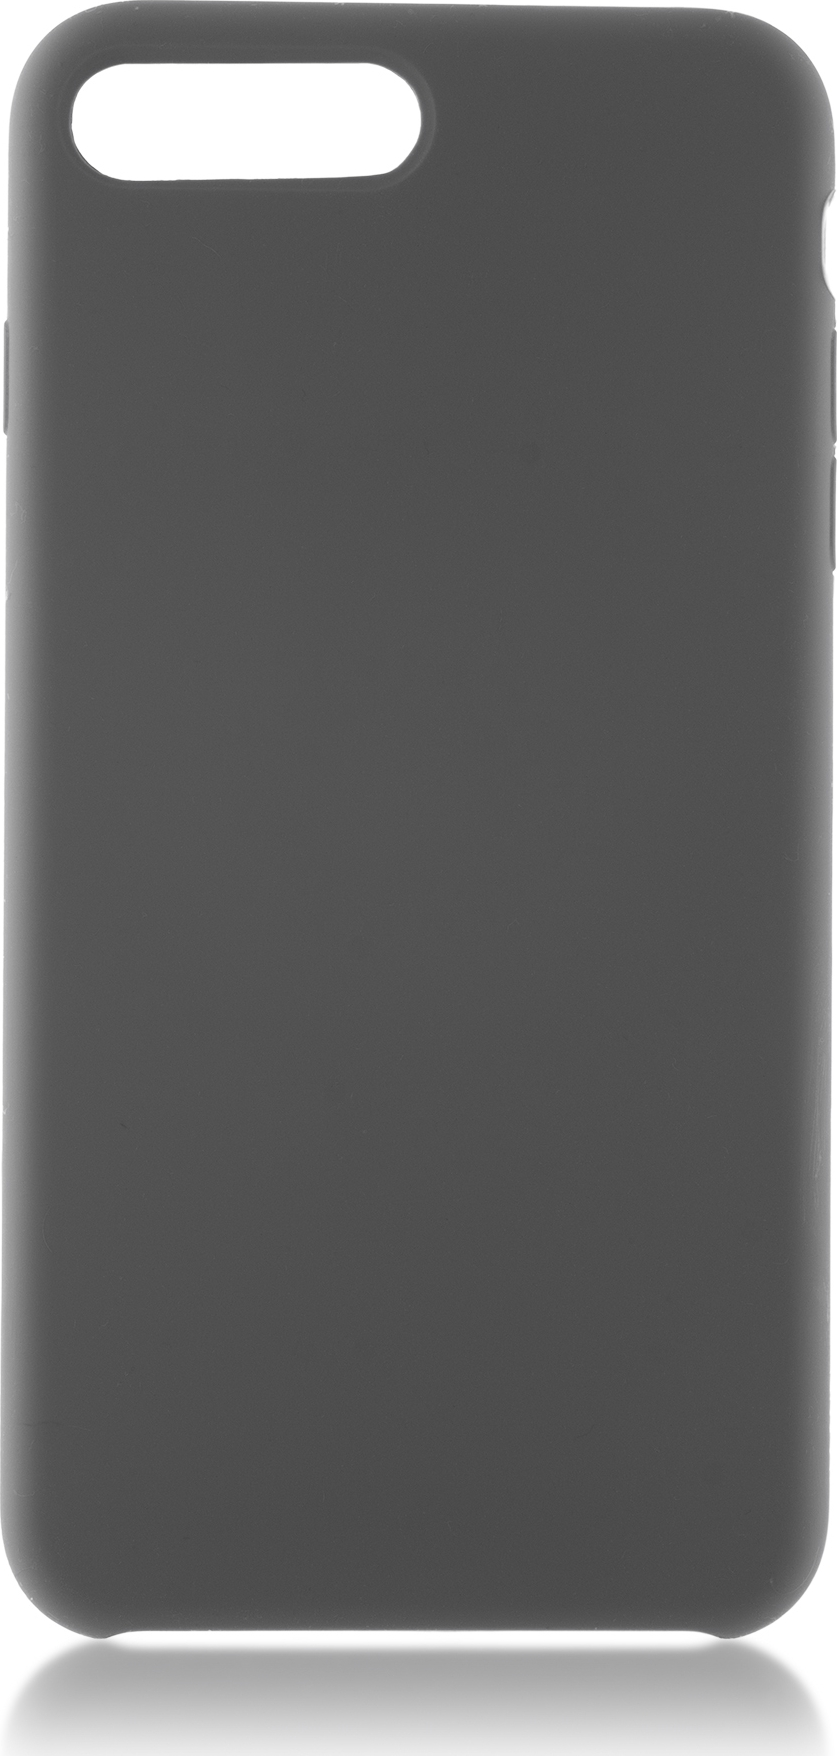 Чехол Brosco Softrubber для Apple iPhone 7 Plus, серый аксессуар чехол для apple iphone 6 brosco soft rubber black ip6 softrubber black